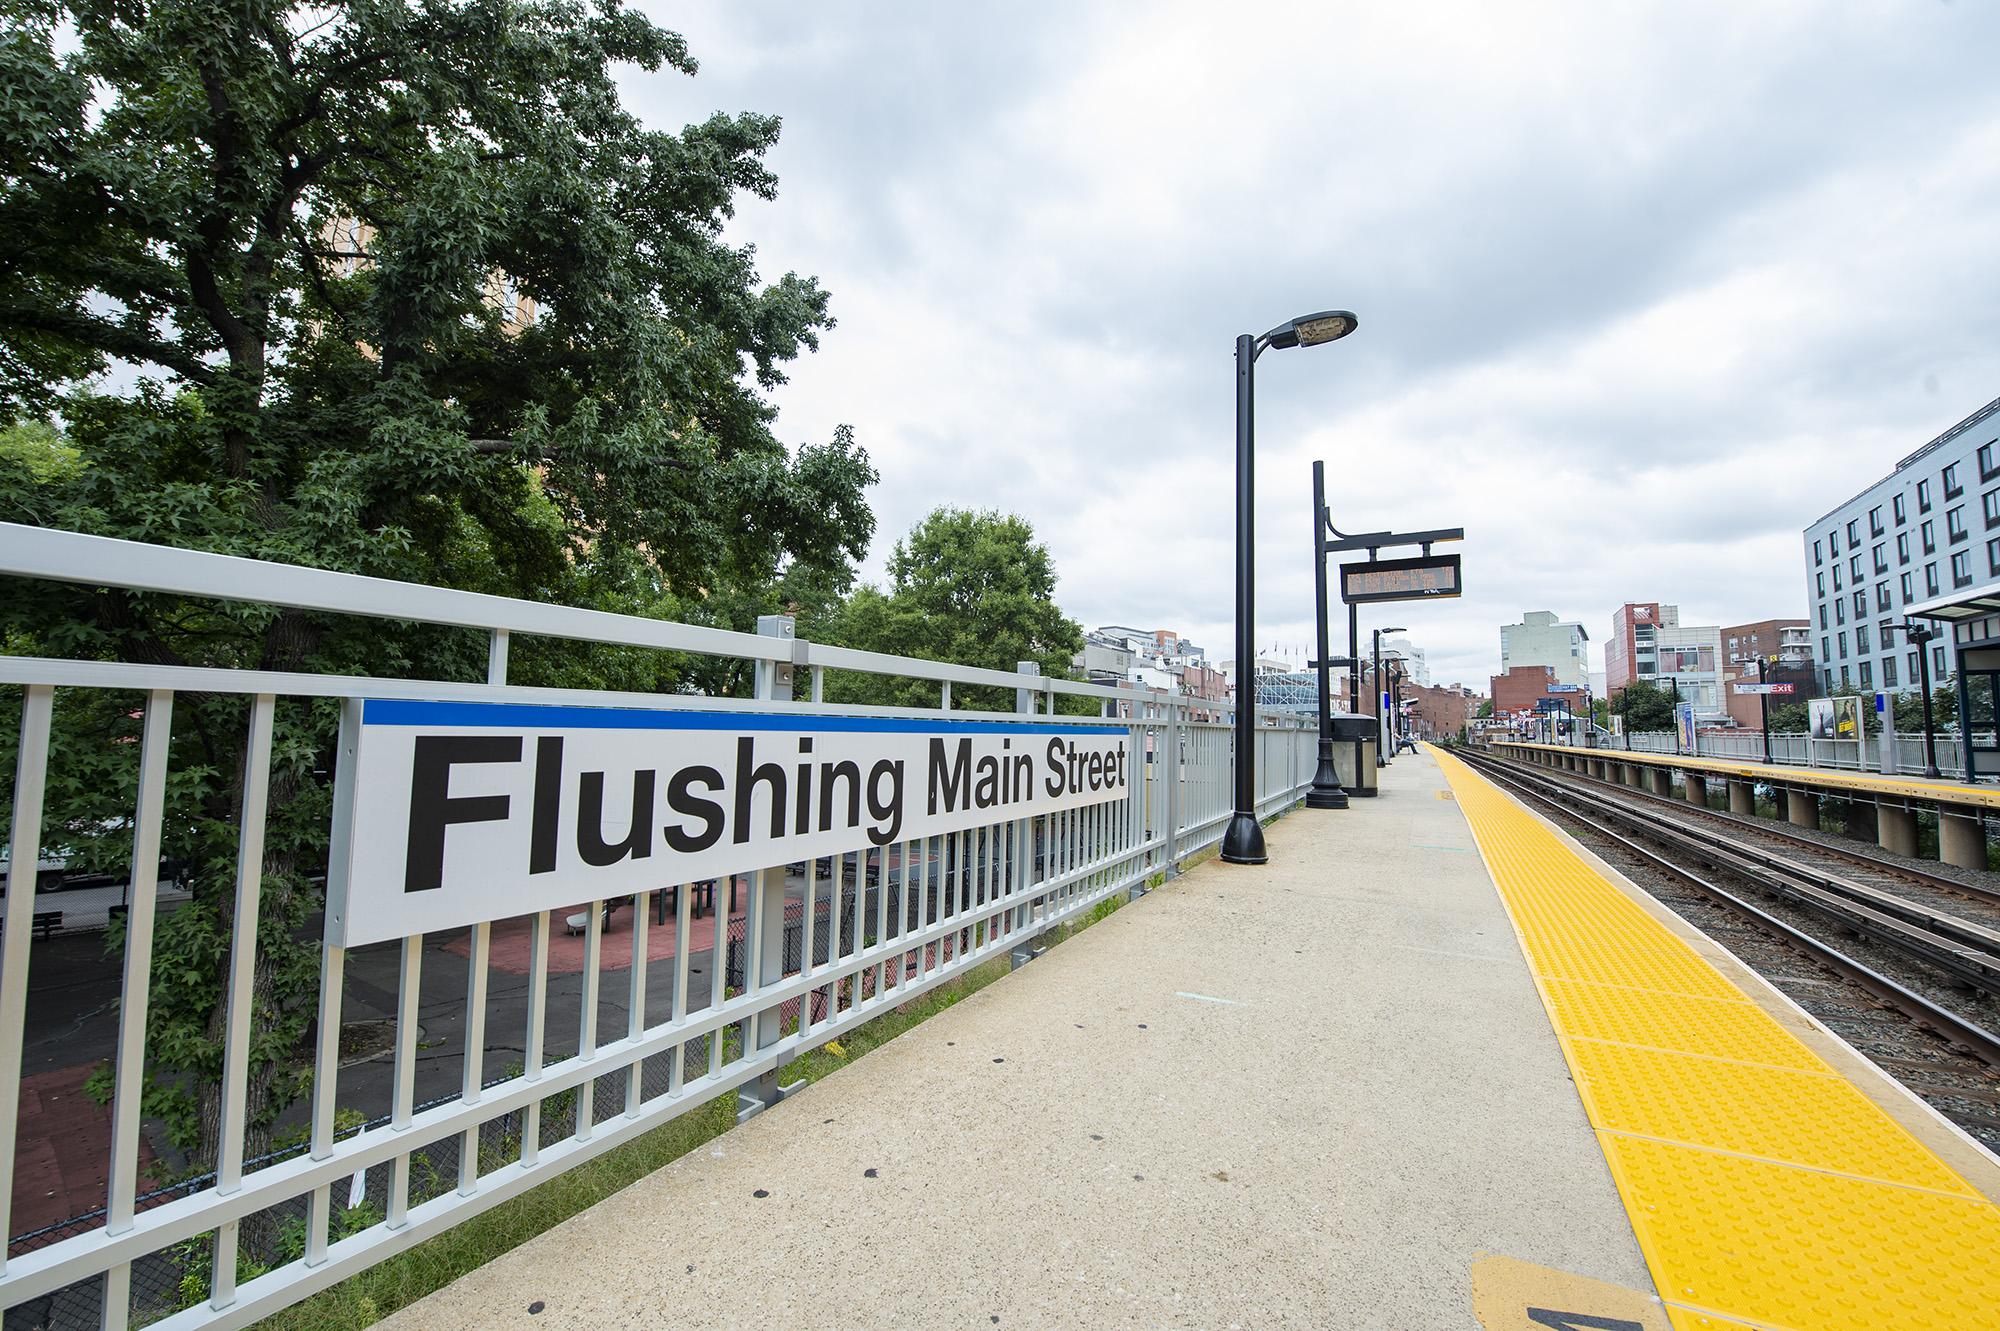 Flushing Main Street Platform A Signage 08-31-18